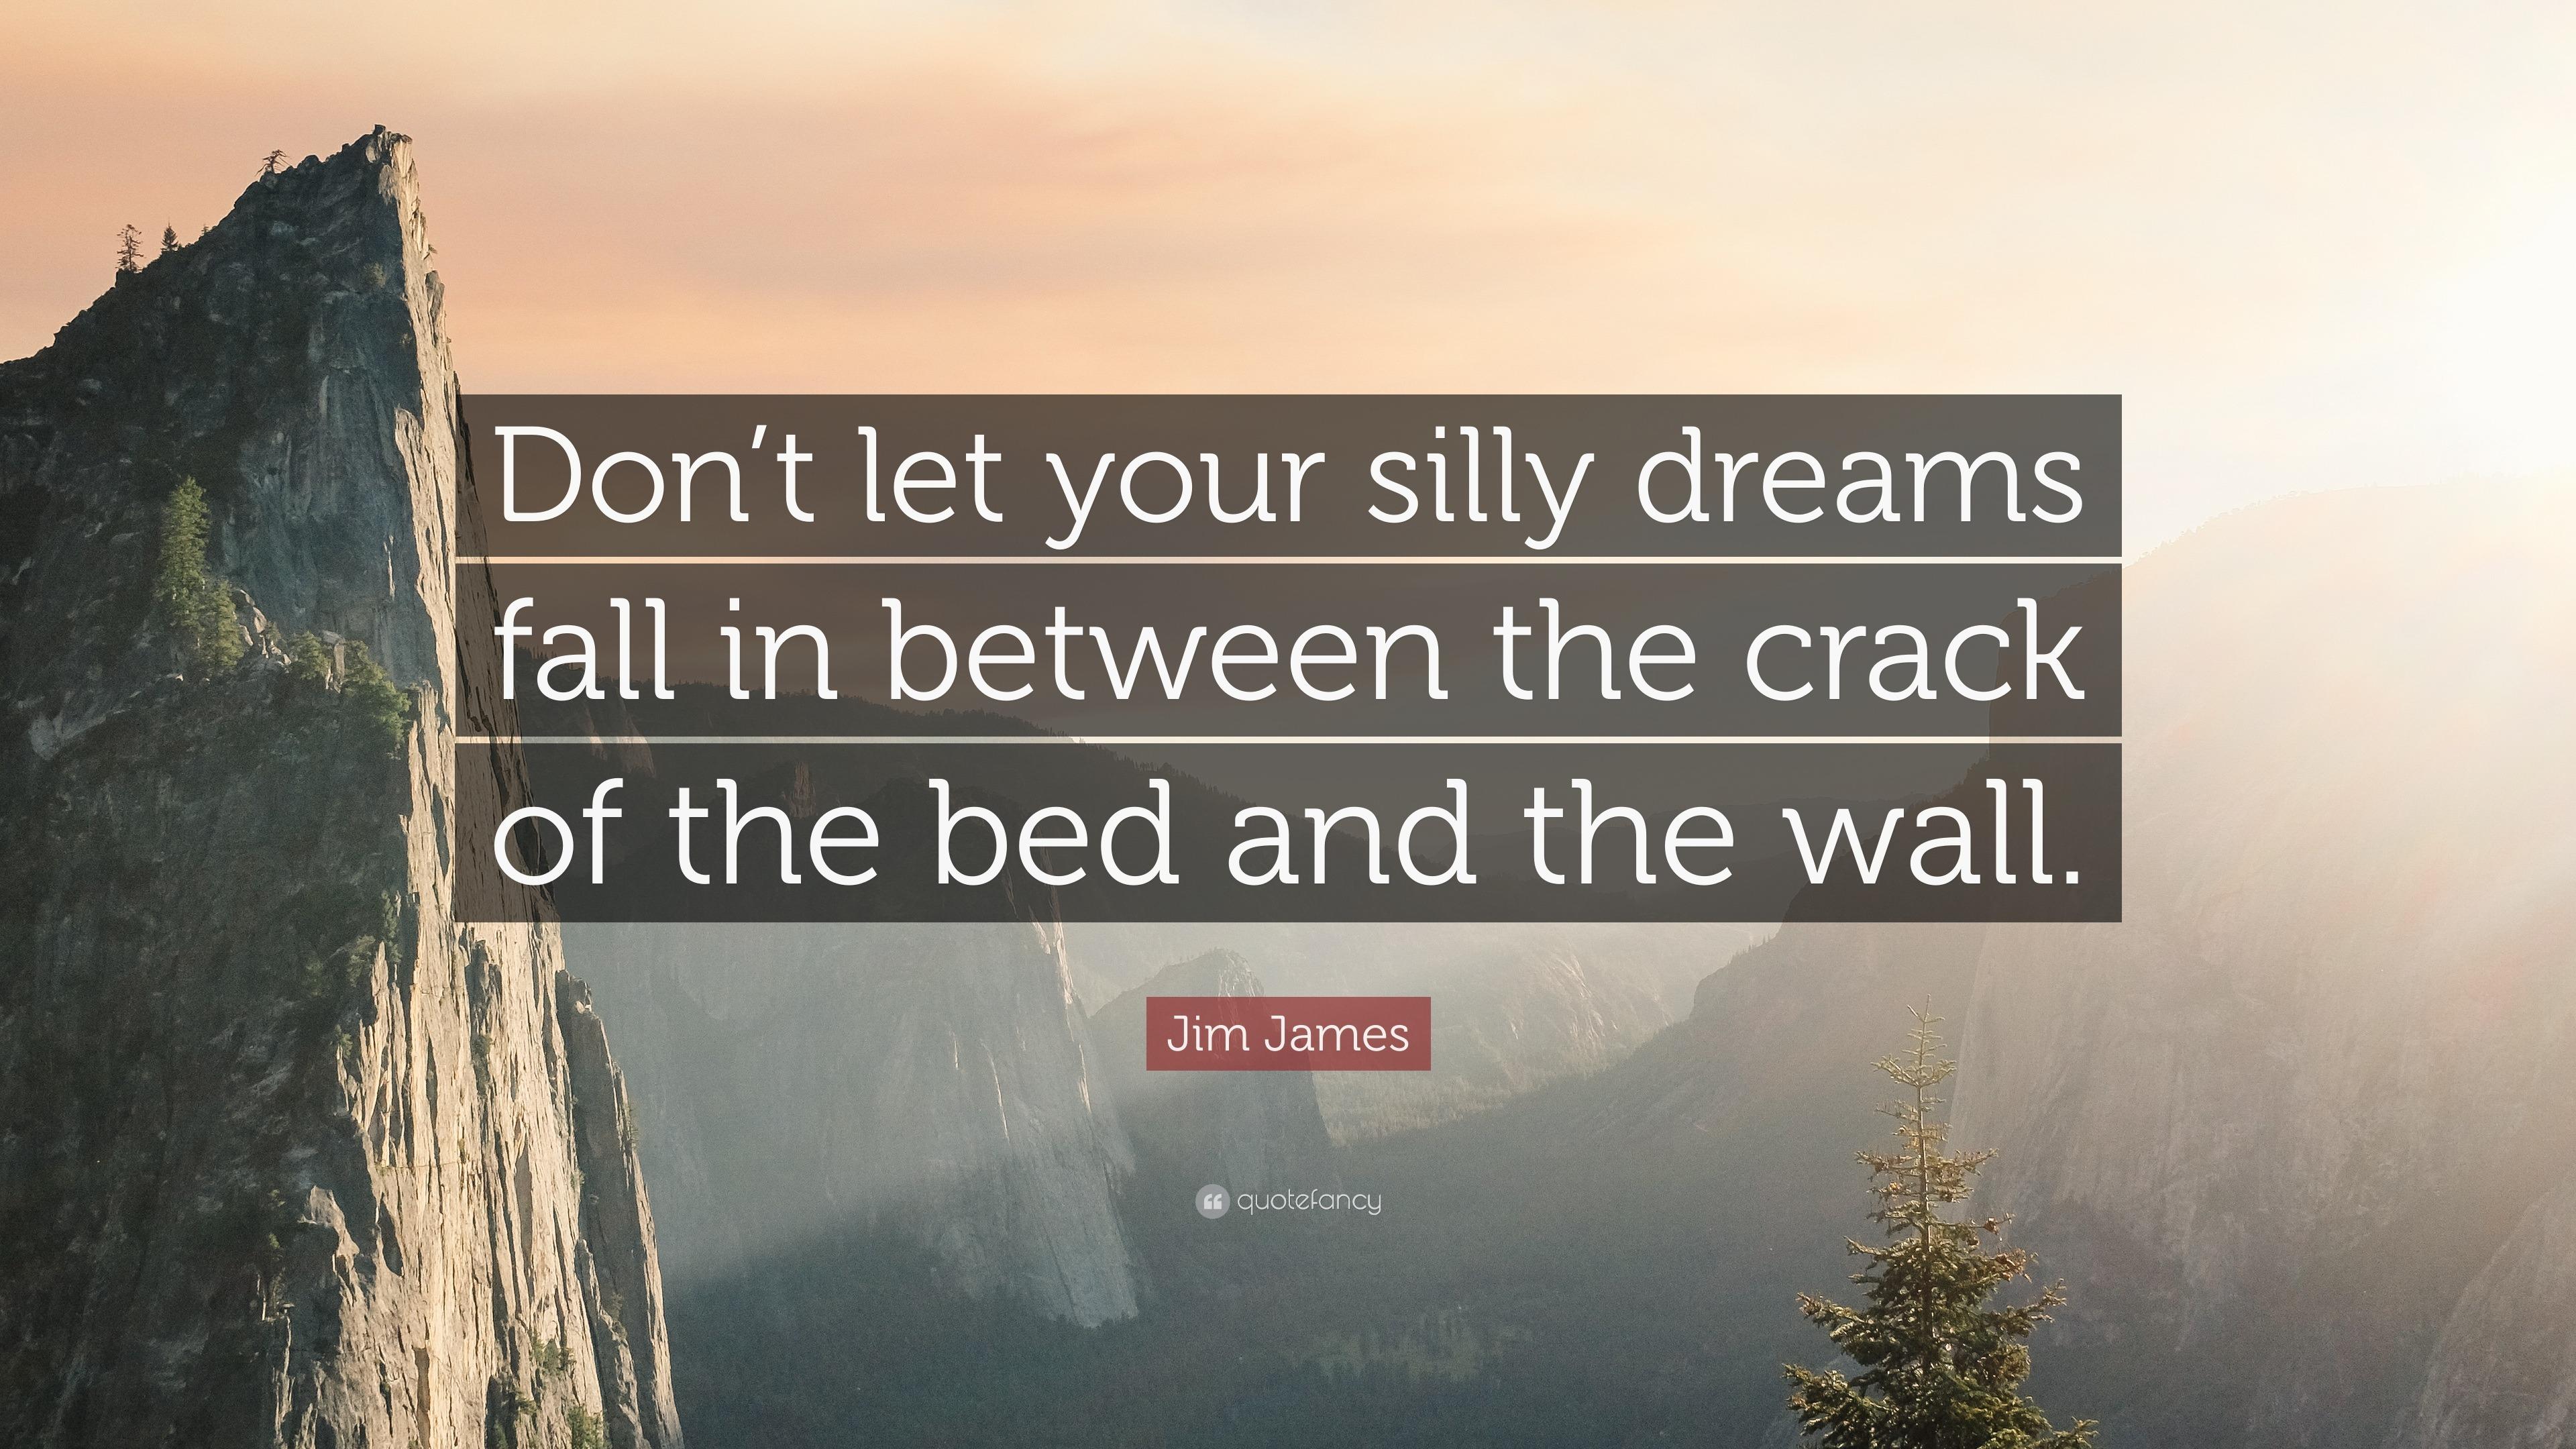 What dreams fall